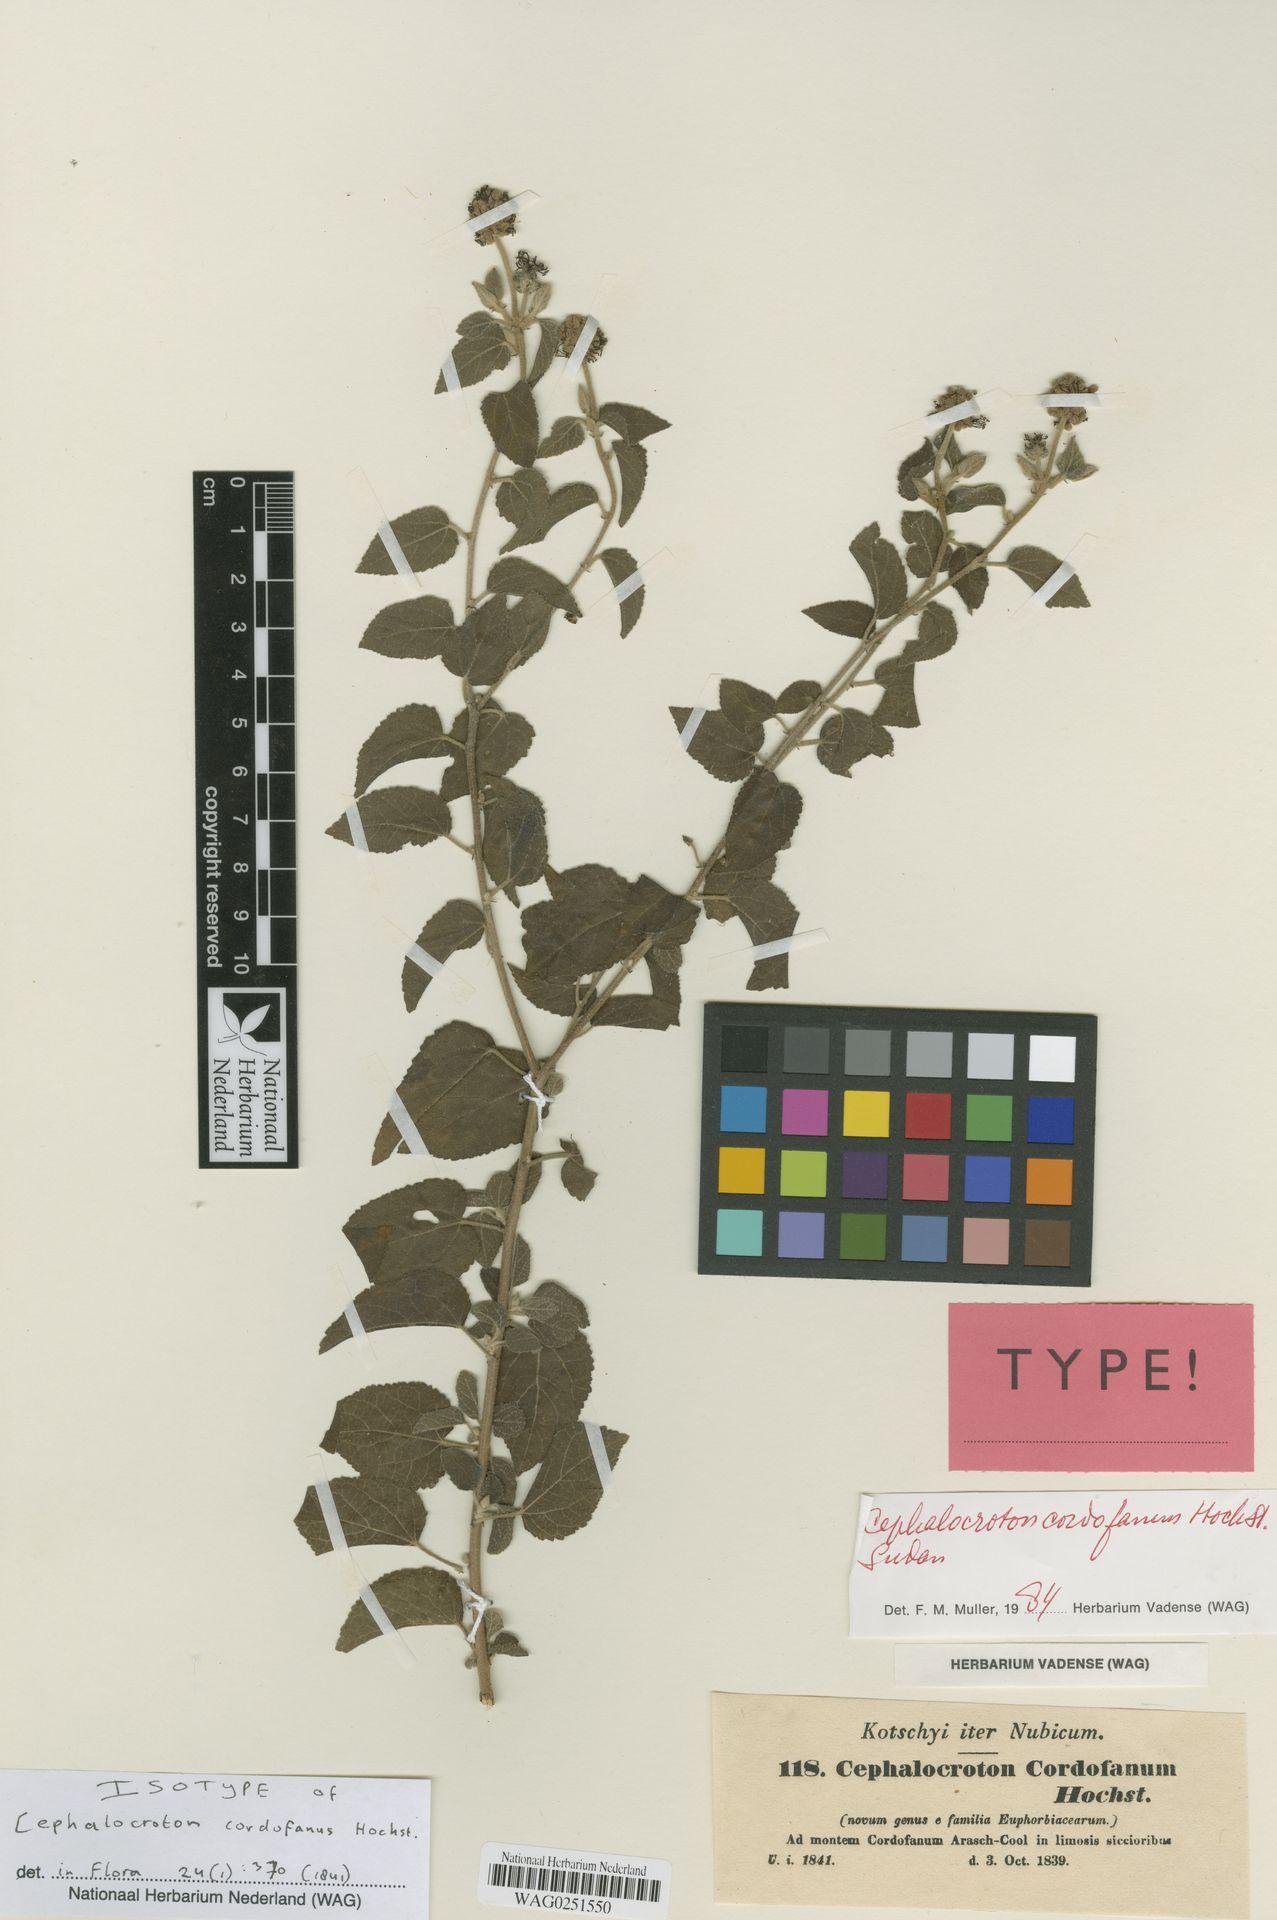 WAG0251550 | Cephalocroton cordofanus Hochst.